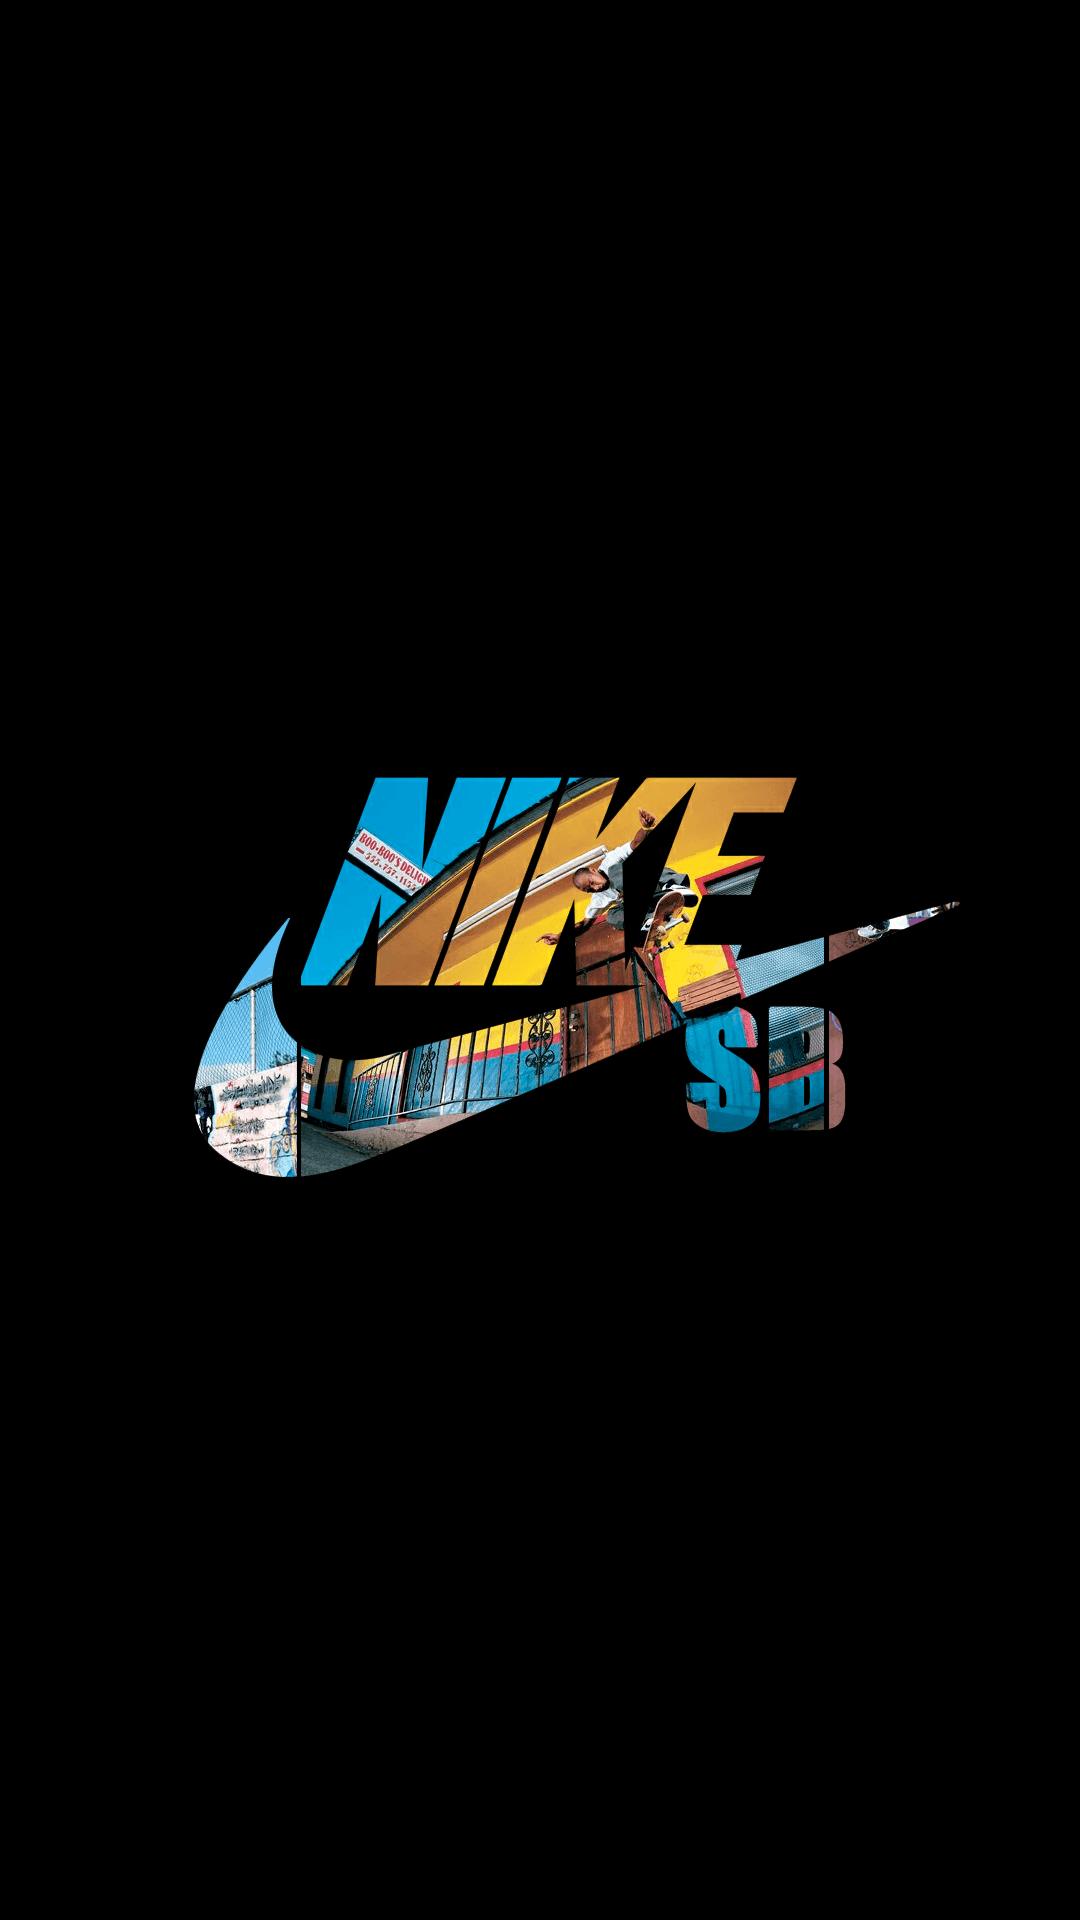 4k Wallpaper Amoled 3D Wallpapers Nike wallpaper Nike logo 1080x1920